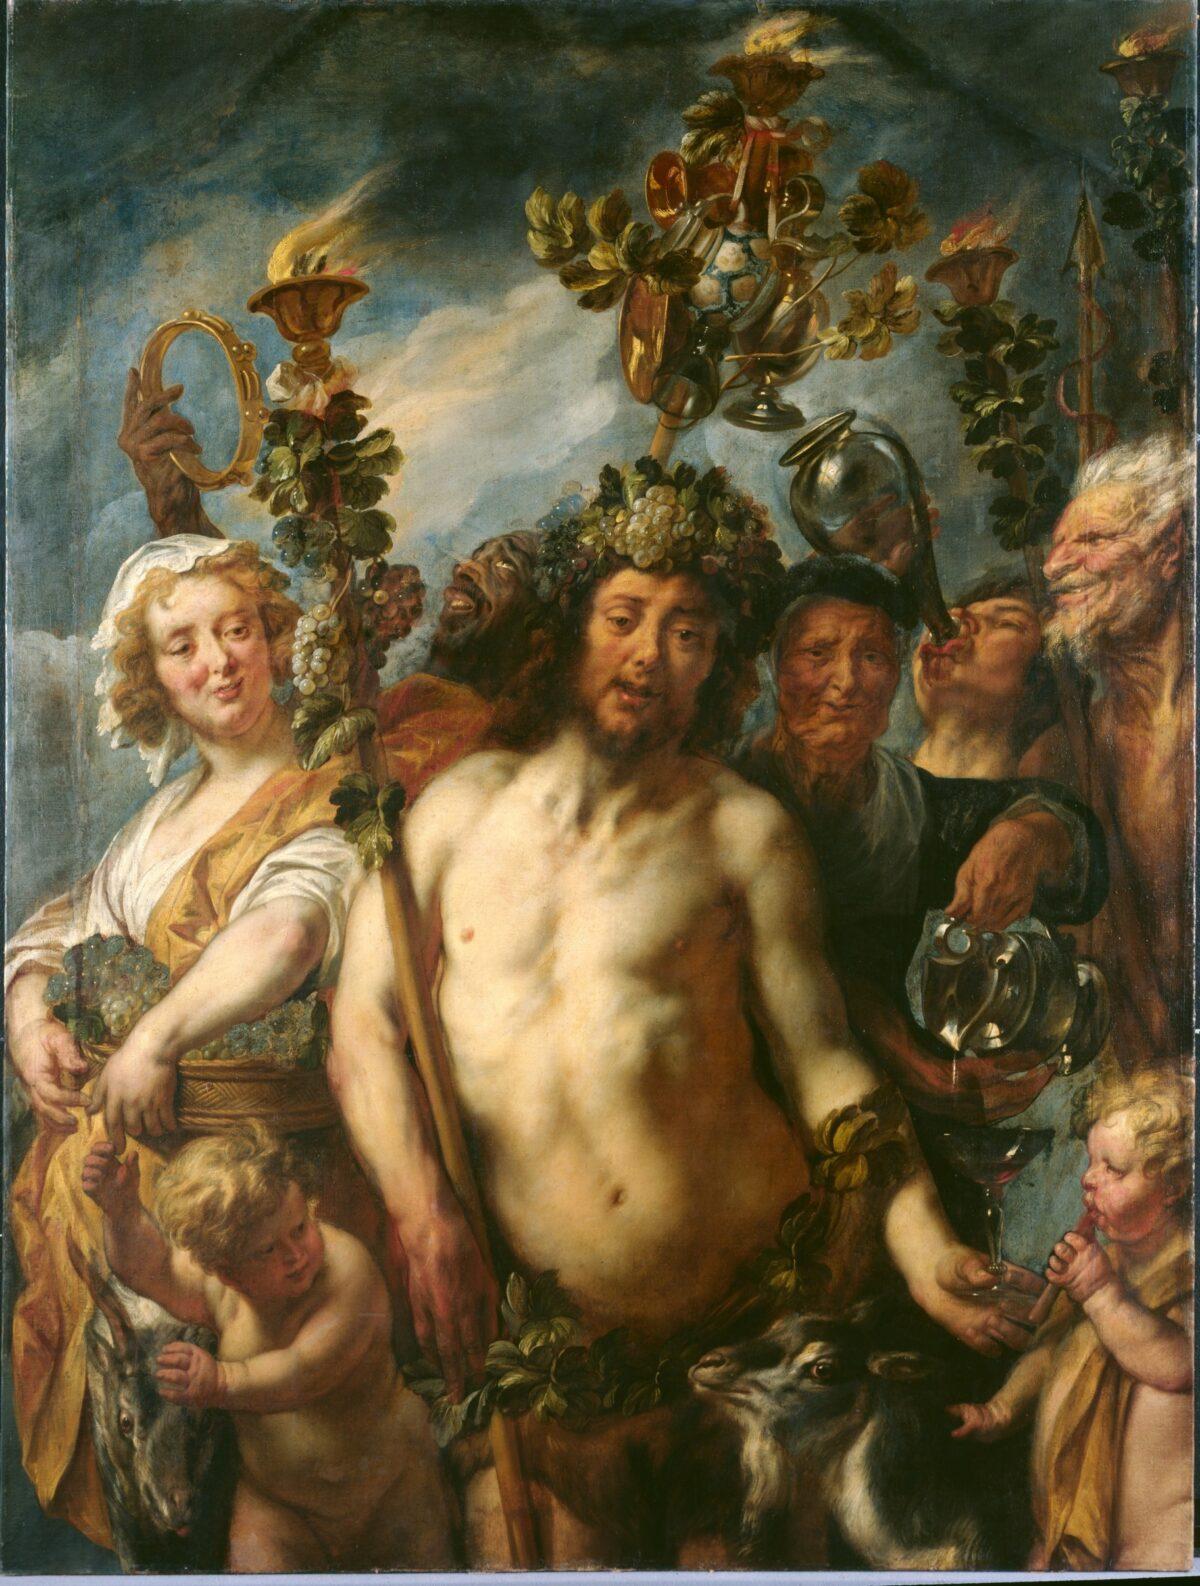 Jacob Jordaens (1593-1678), The Triumph of Bacchus, ca. 1645, Staatliche Gemäldegalerie, Kassel © Museumlandschaft Hessen Kassel